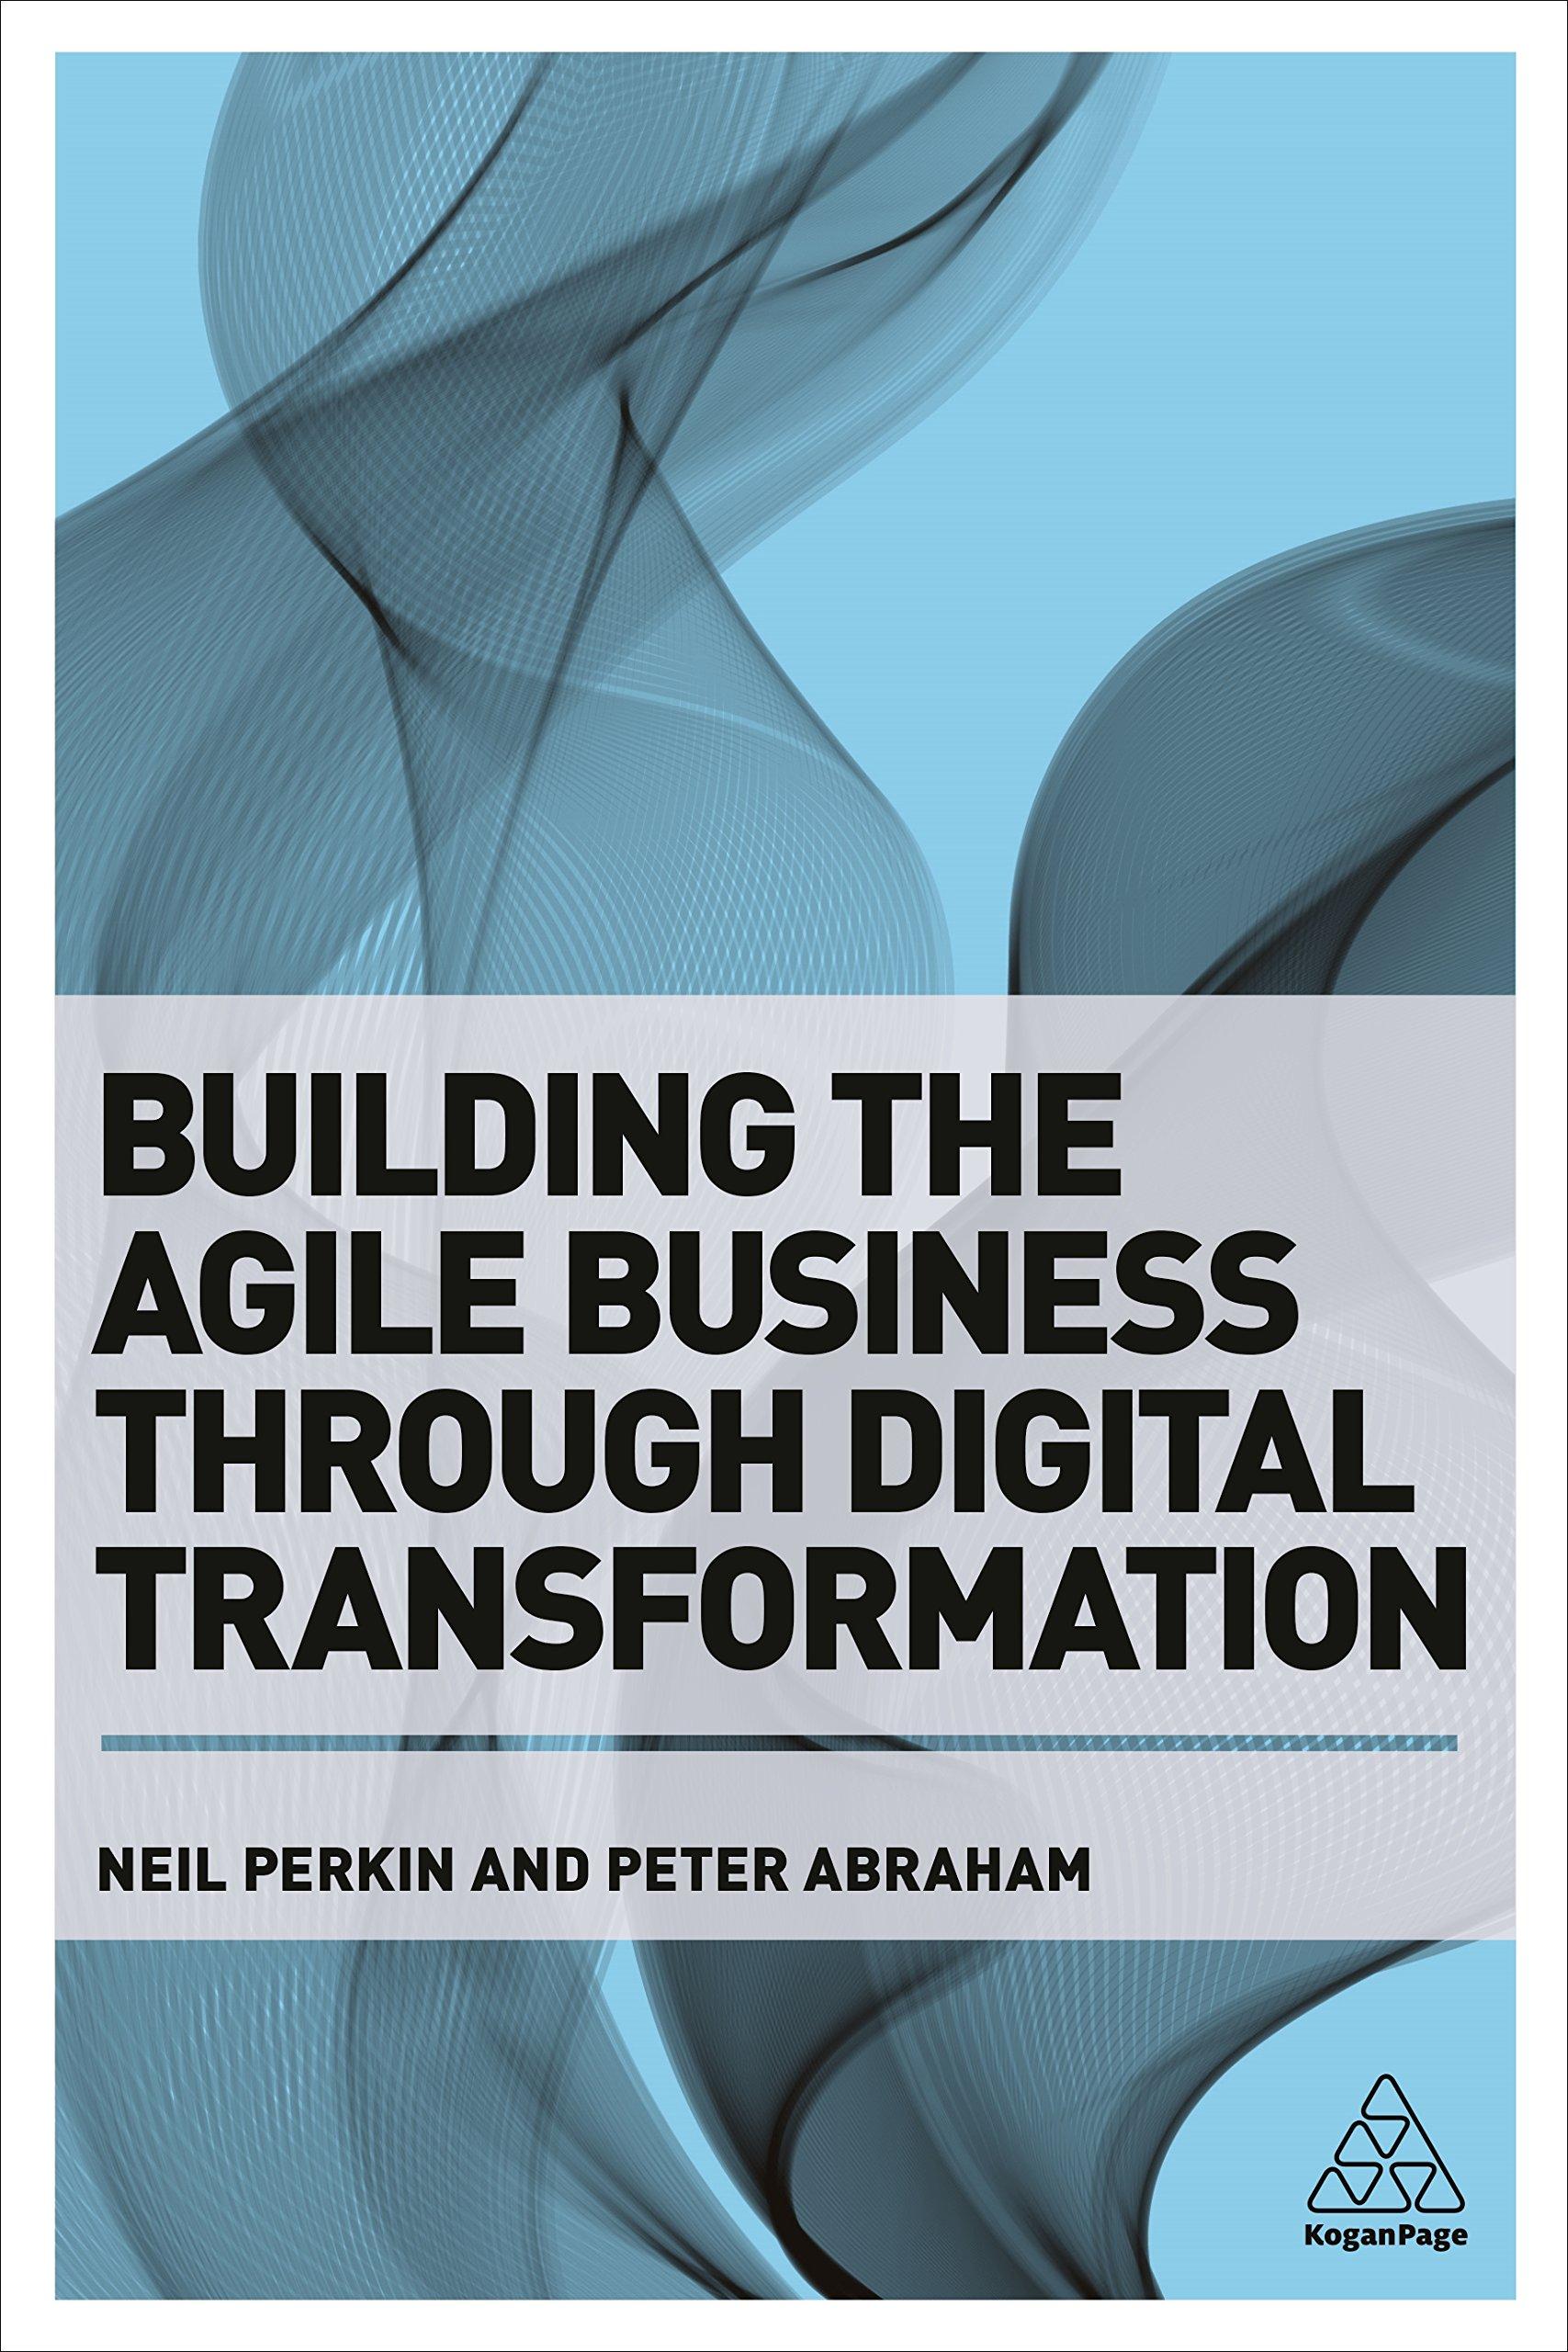 Amazon.com: Building the Agile Business through Digital ...